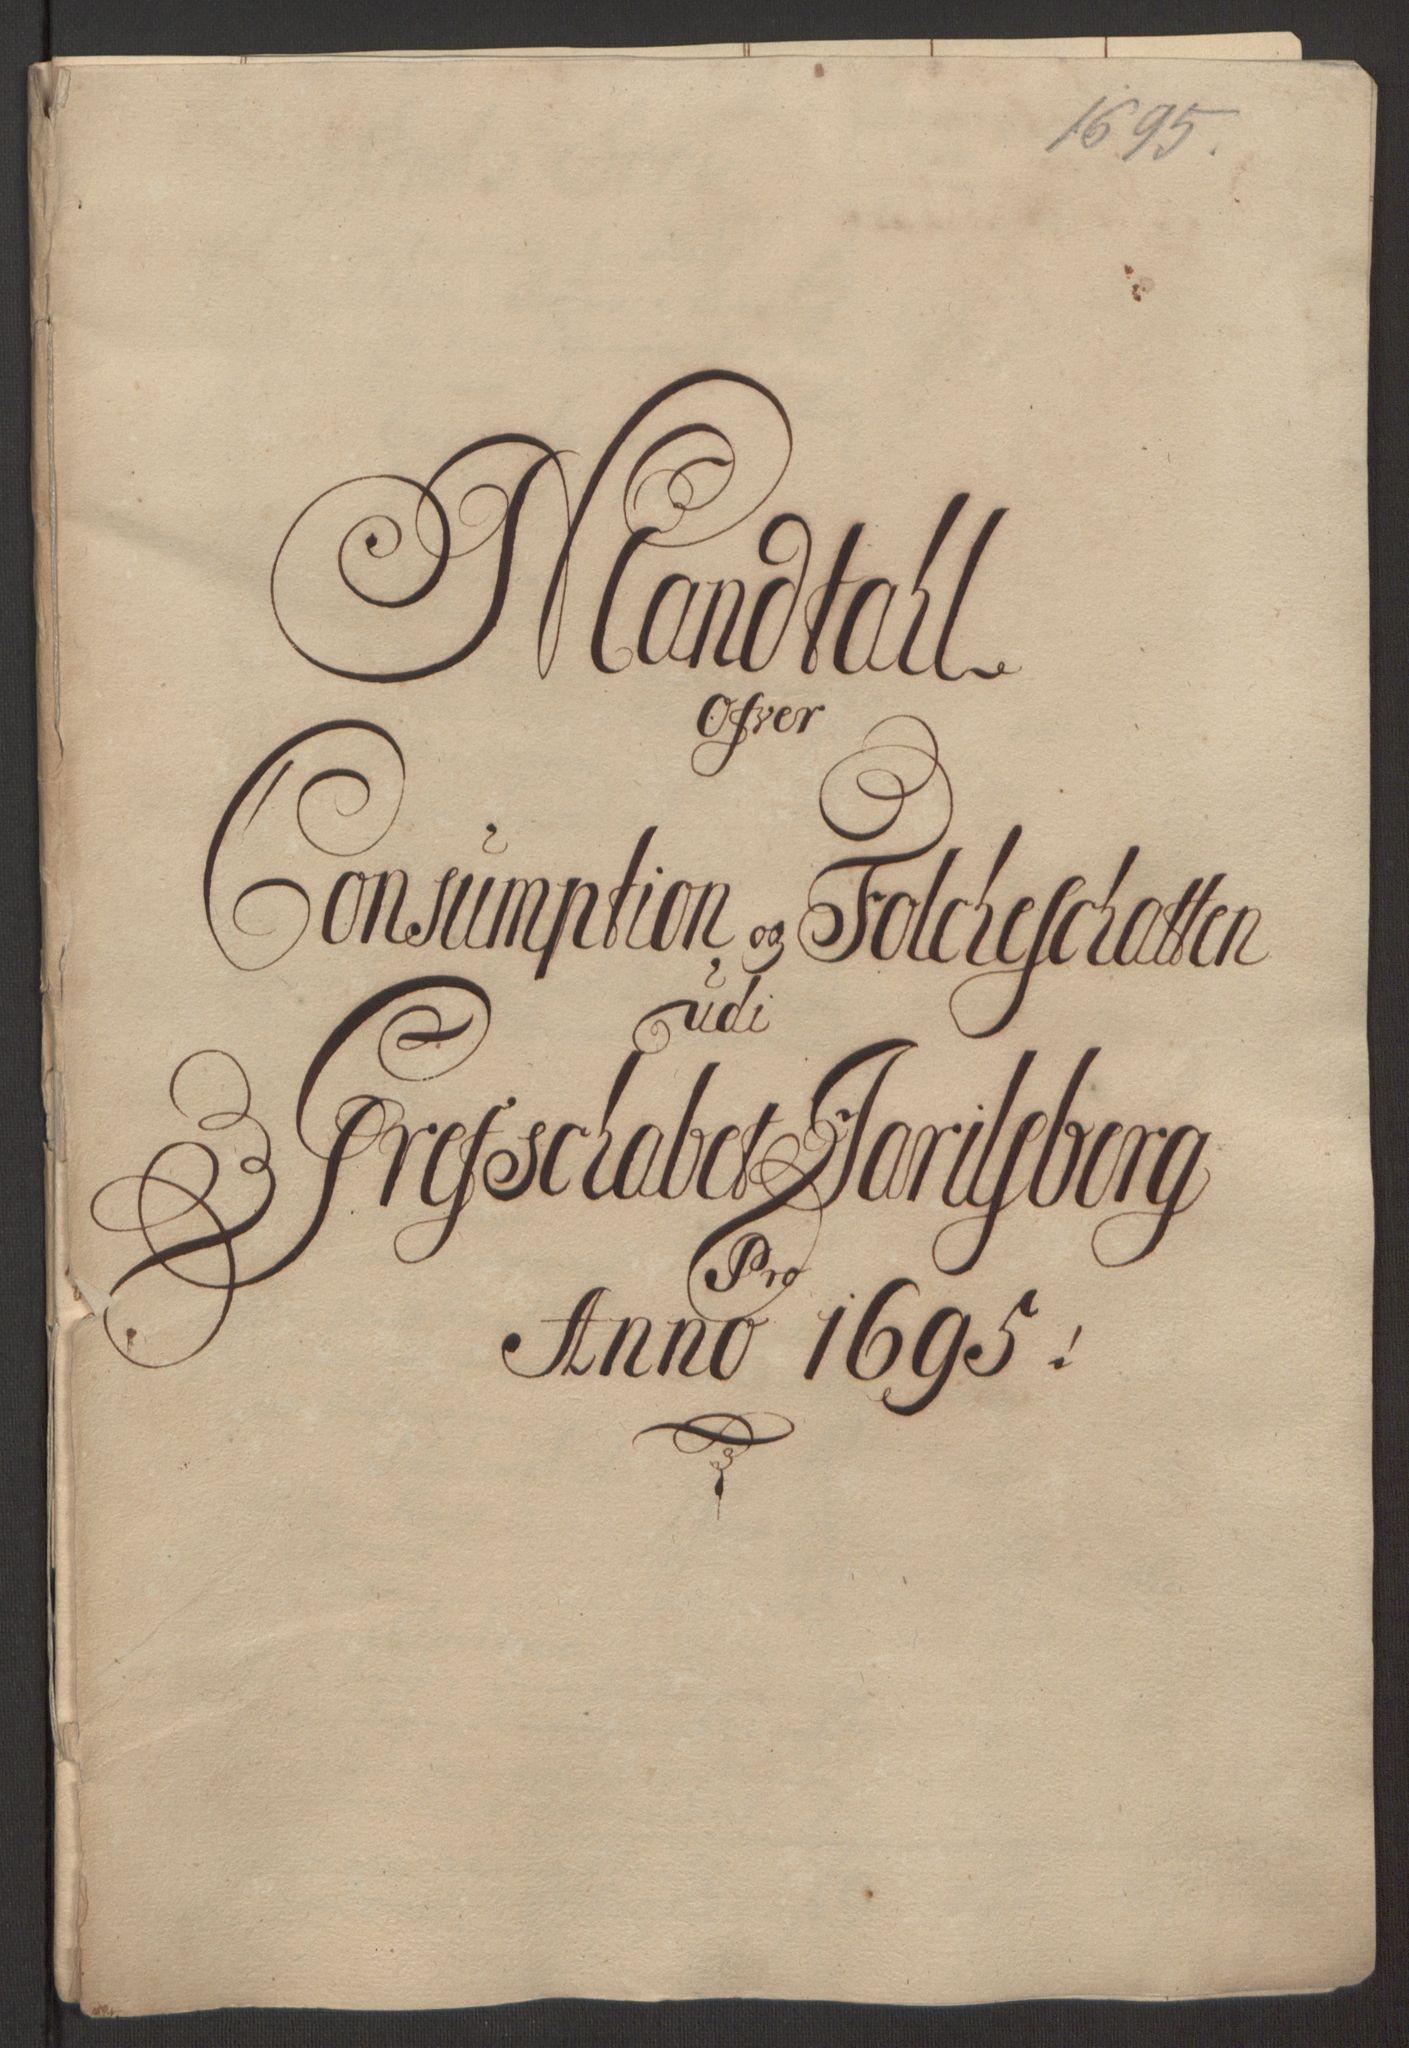 RA, Rentekammeret inntil 1814, Reviderte regnskaper, Fogderegnskap, R32/L1867: Fogderegnskap Jarlsberg grevskap, 1694-1696, s. 144